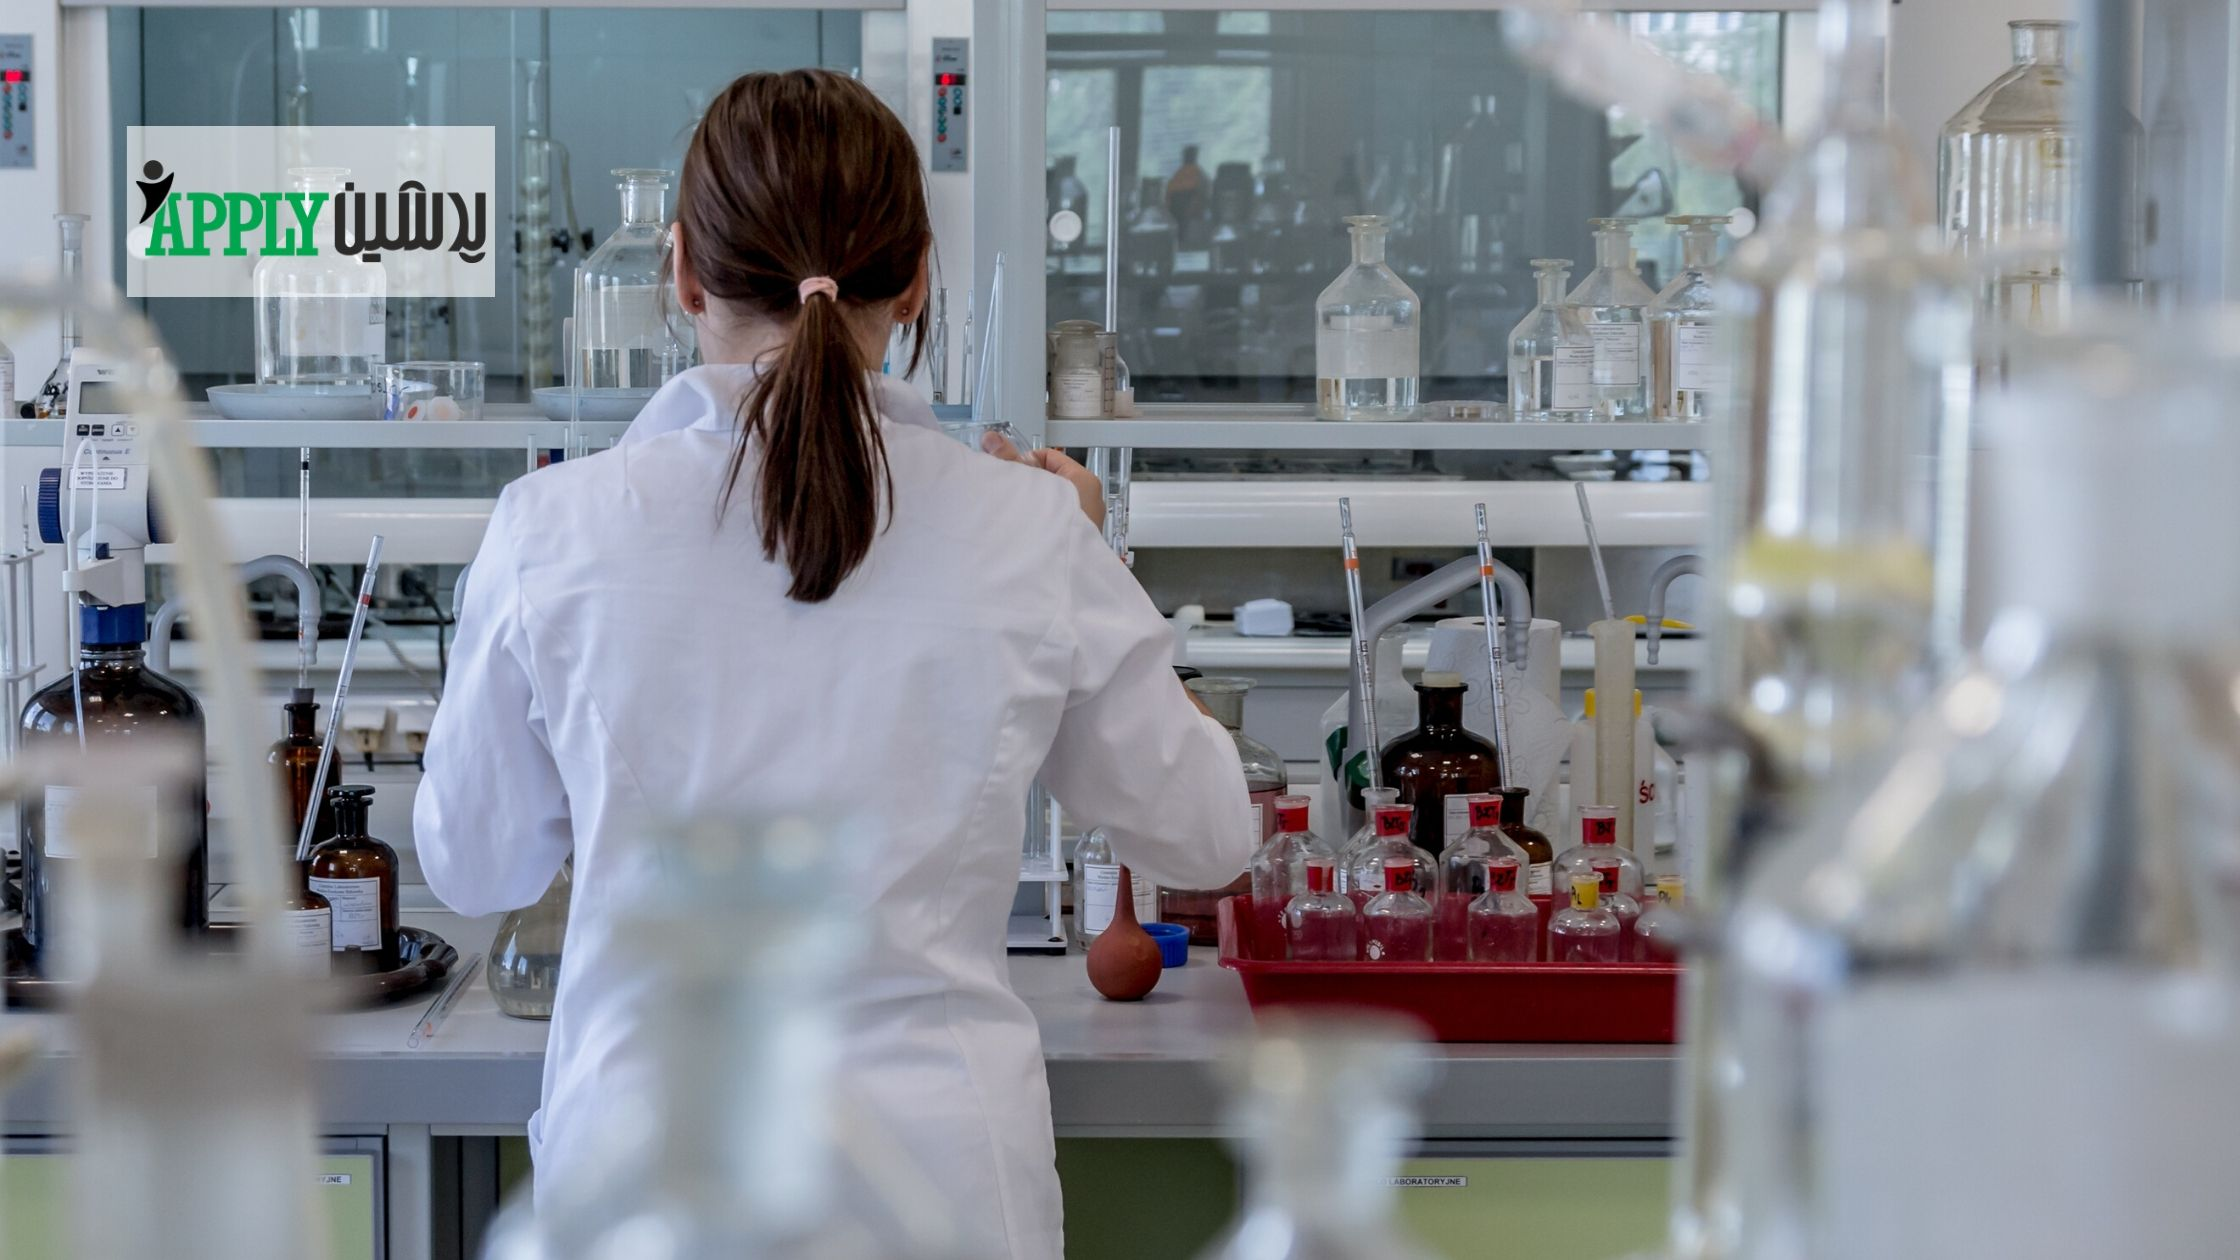 کشف واکسن کرونا توسط روسیه